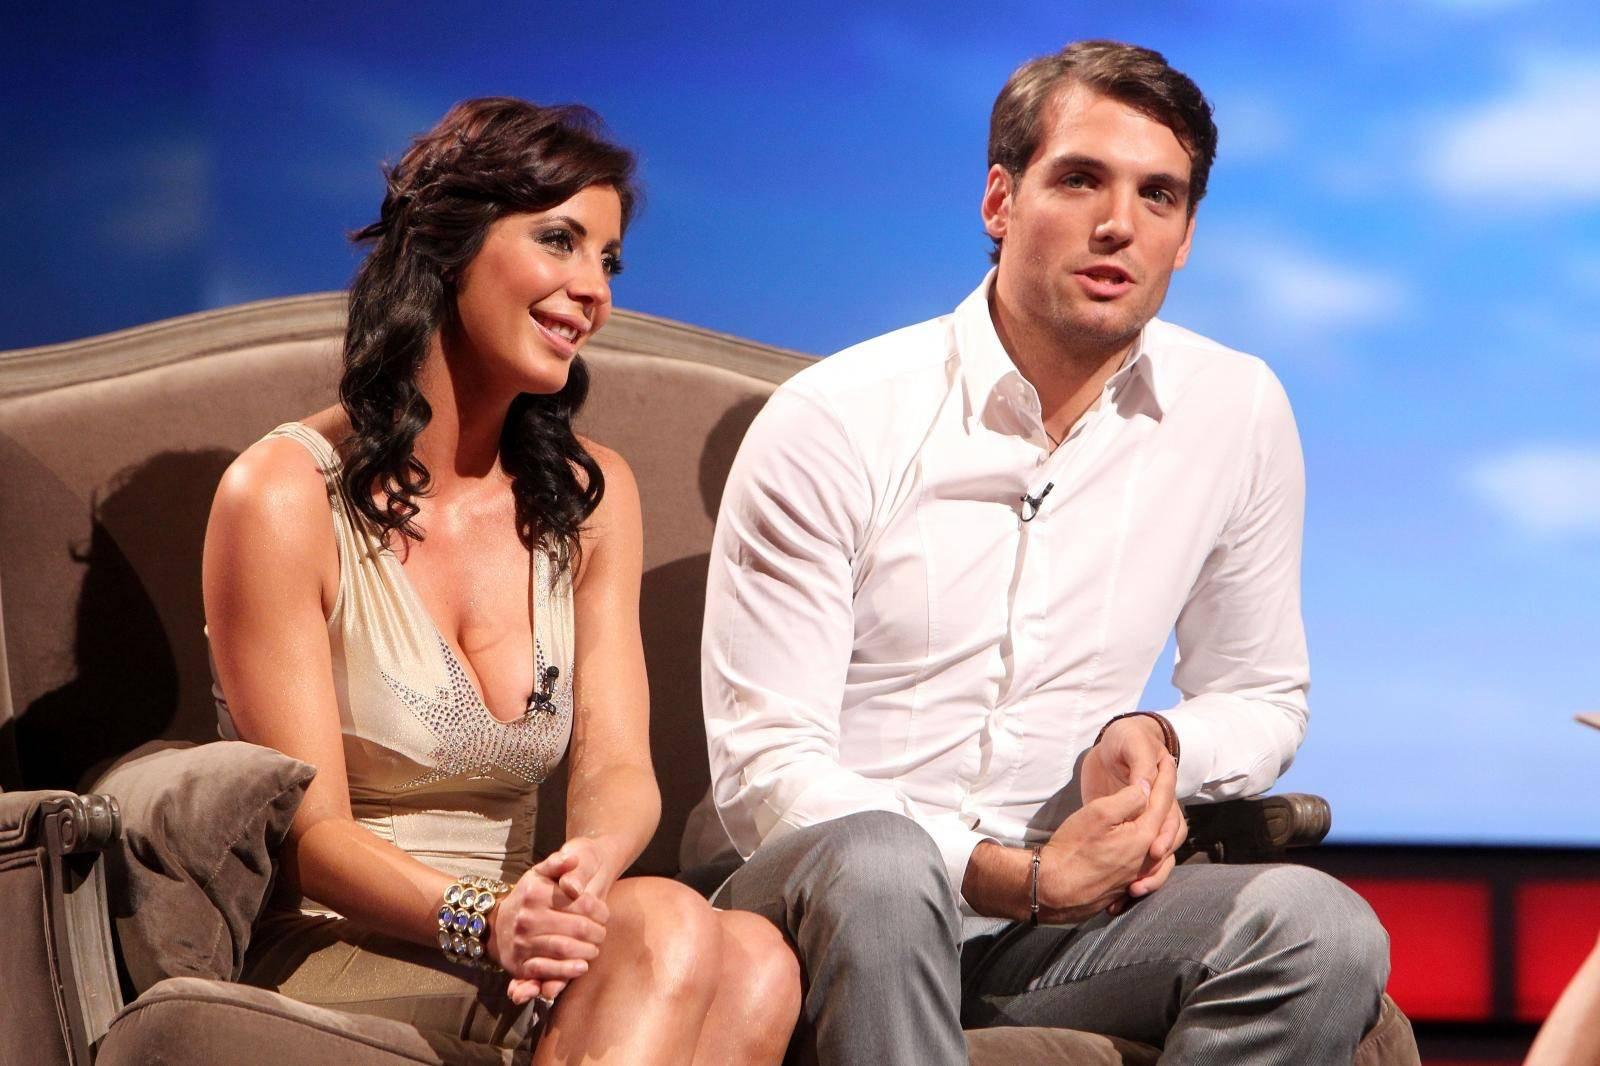 Ivana Paris o razvodu: Dino je iselio, sinovi su razlog za borbu